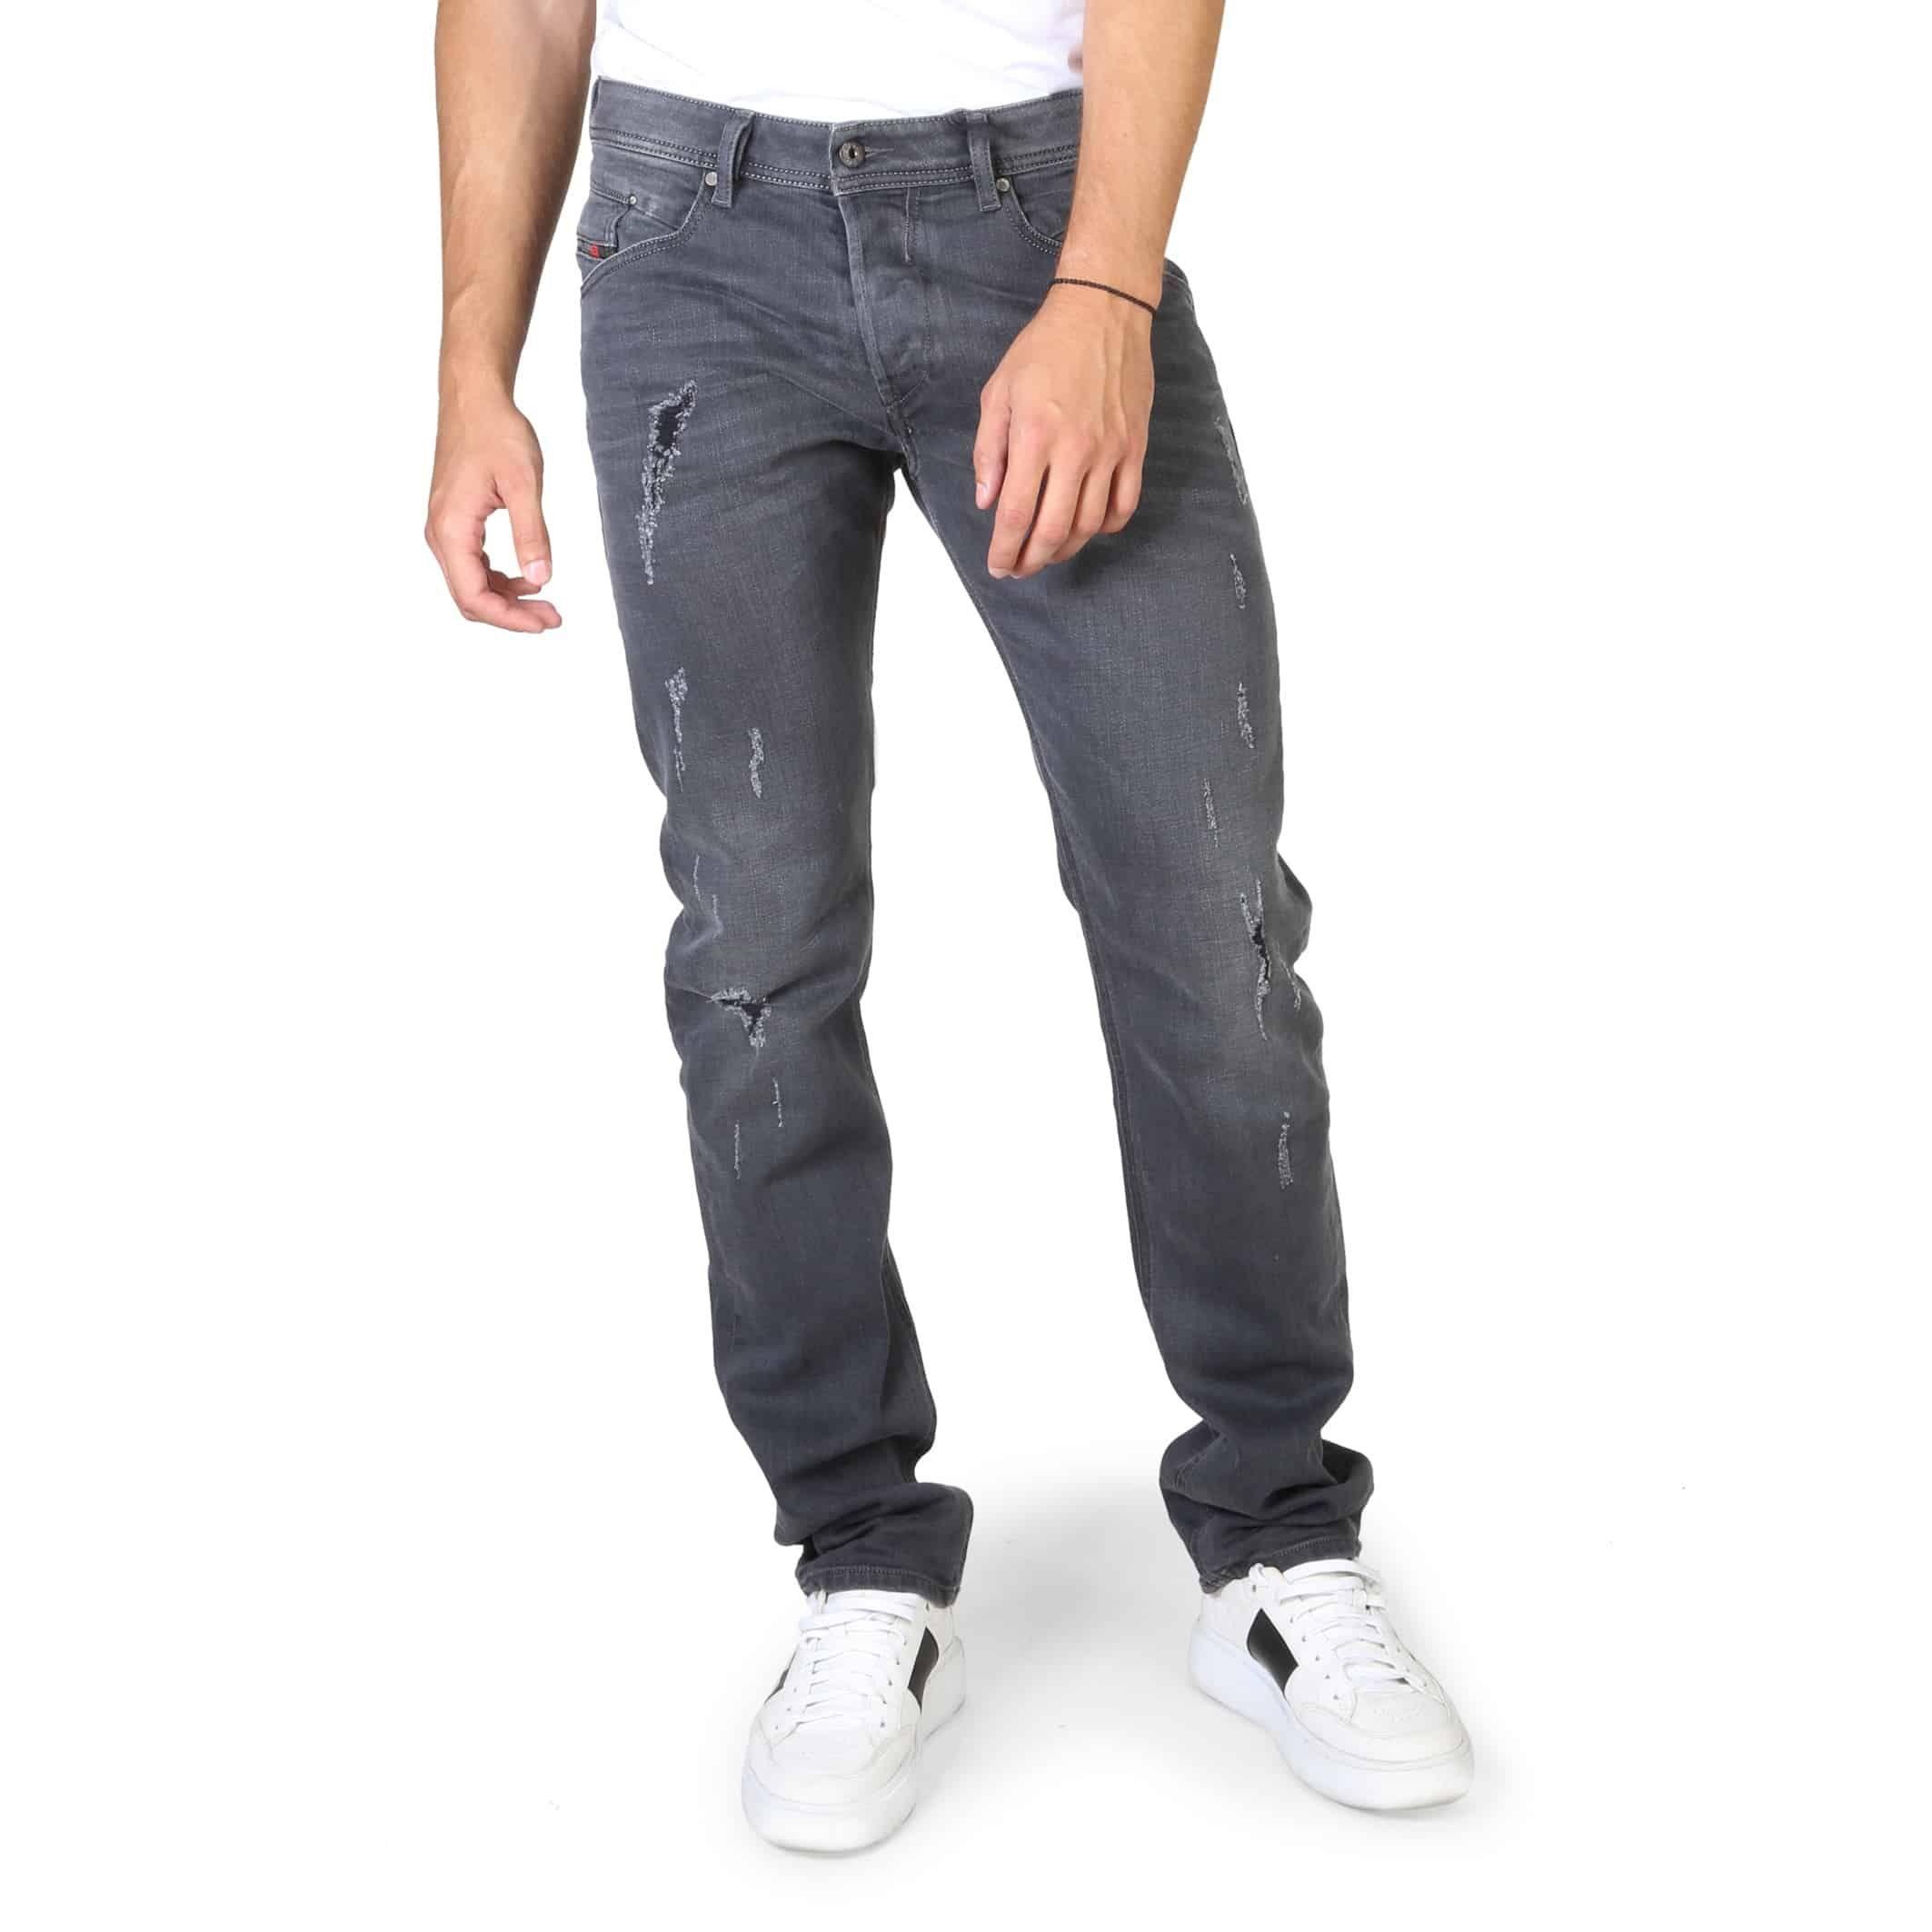 Diesel – BELTHER L32 Jeans